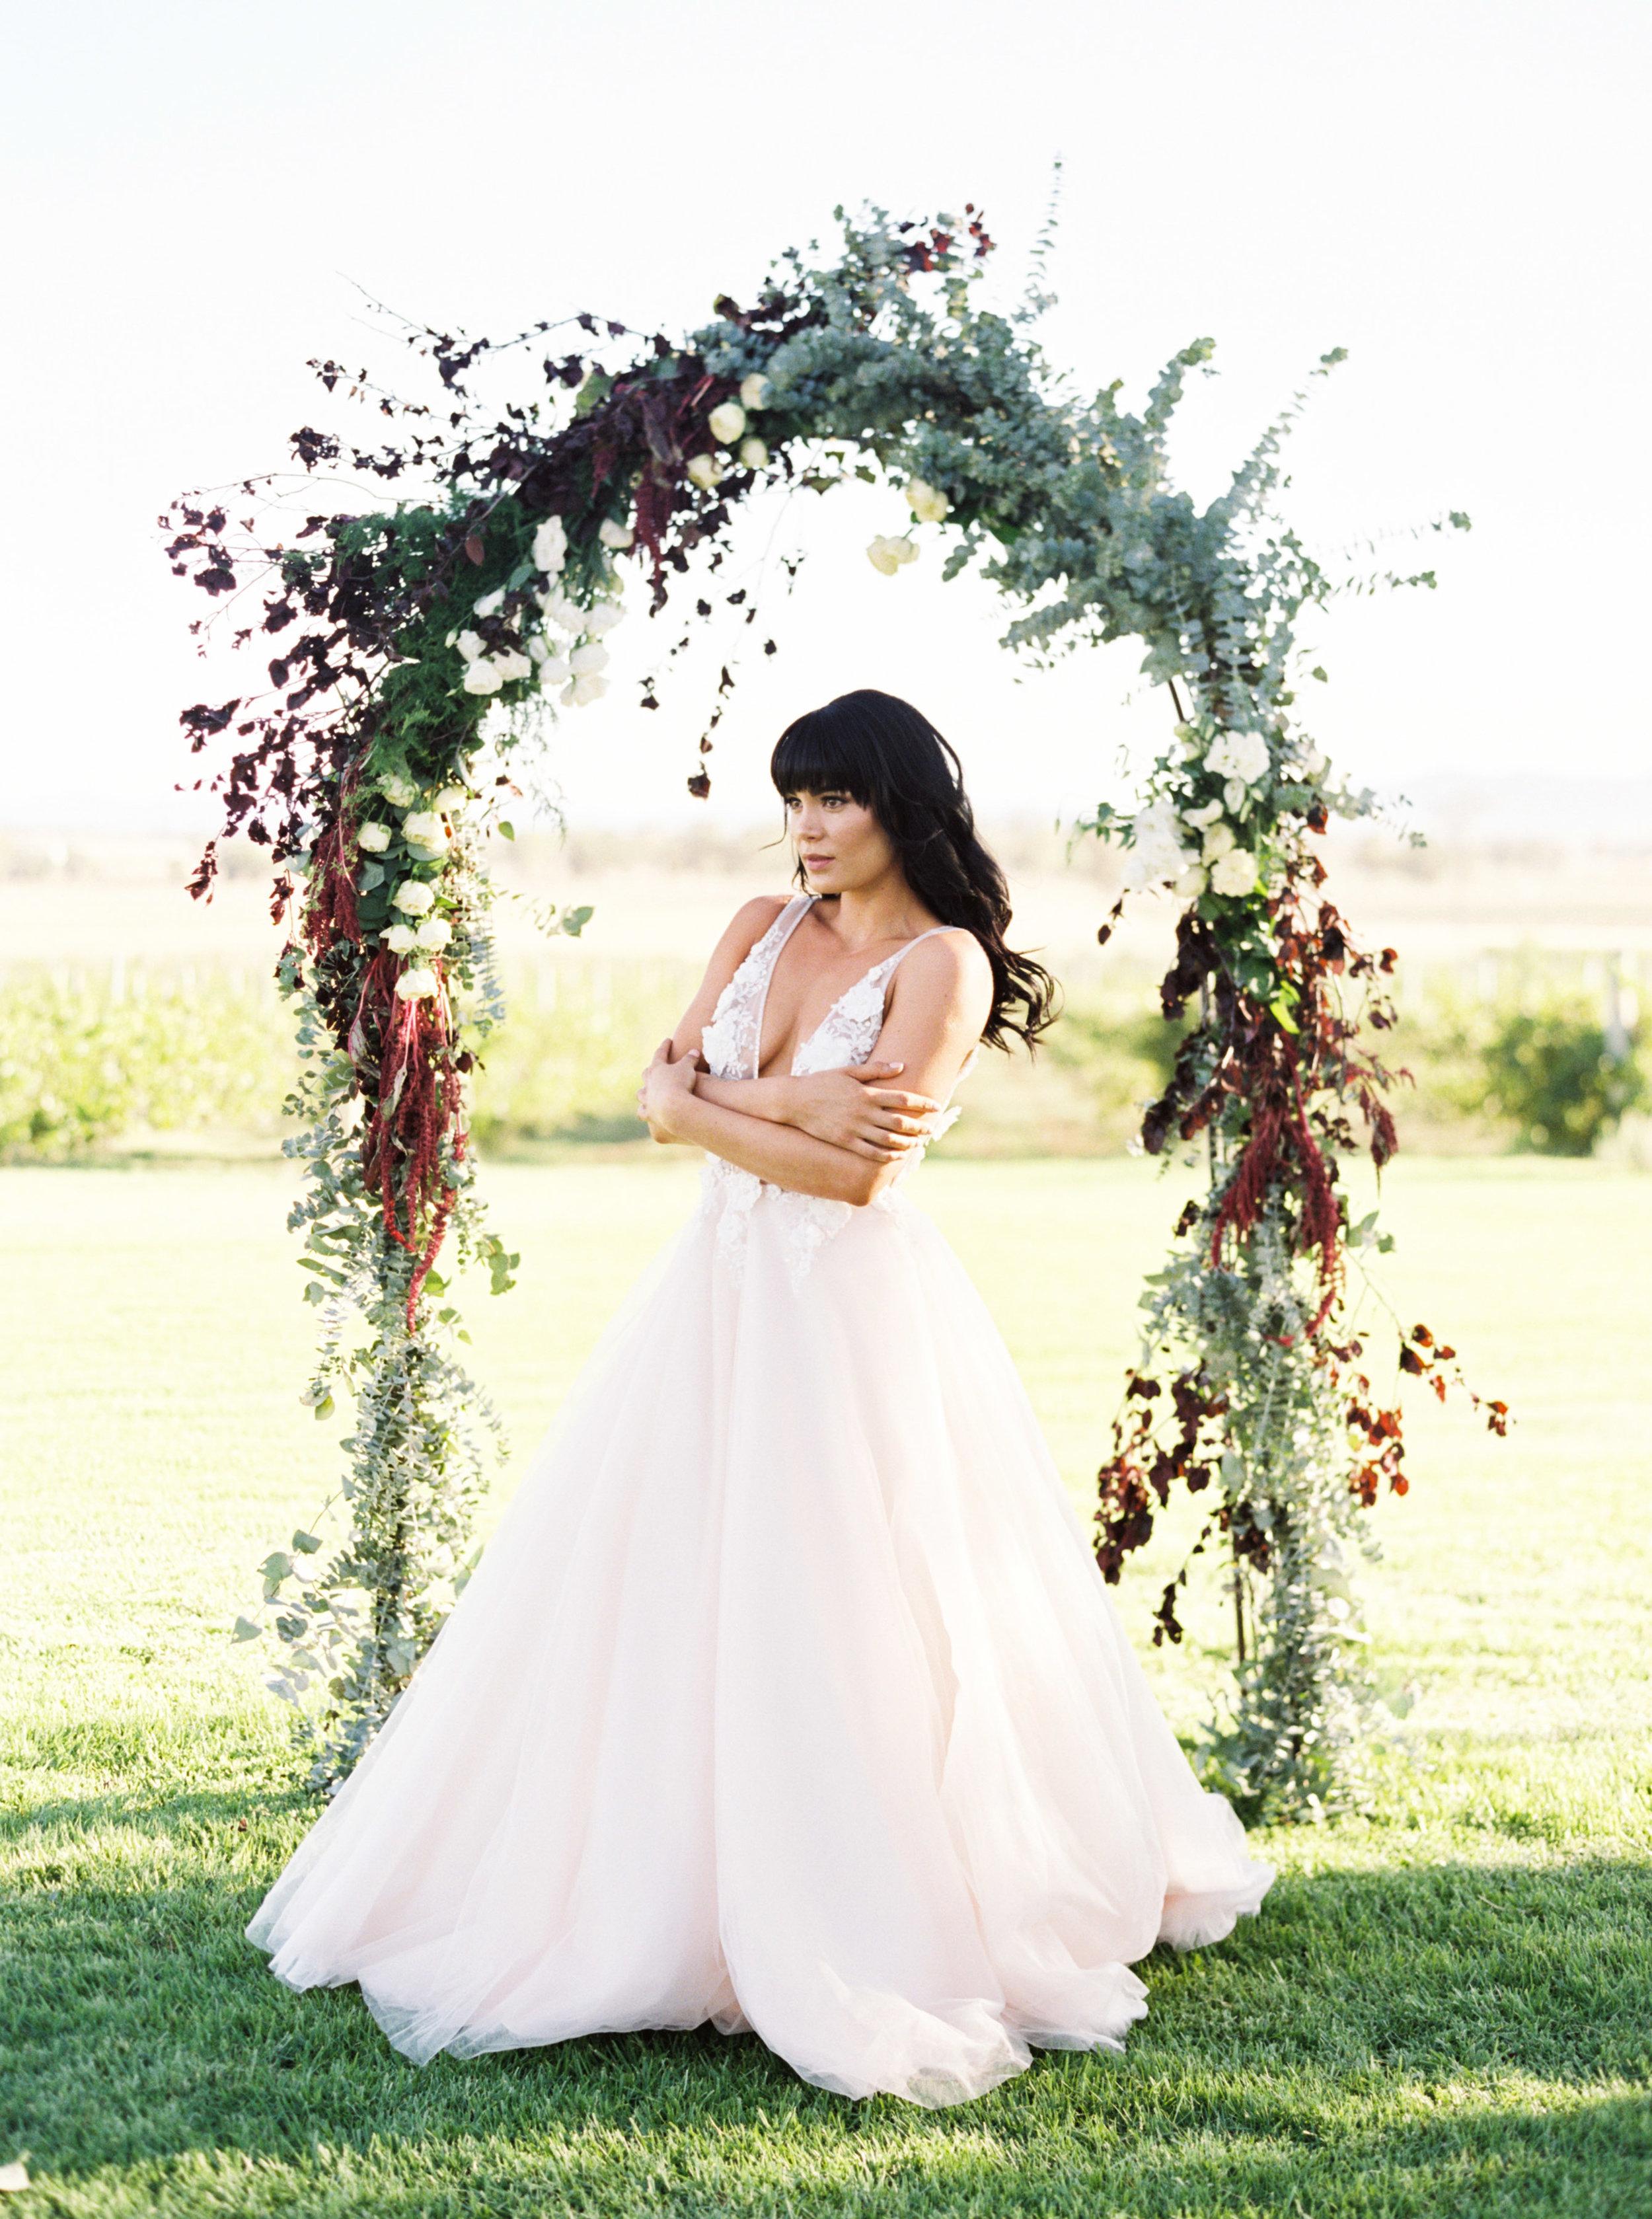 00020- Tamworth NSW Wedding Photographer Sheri McMahon-2.jpg